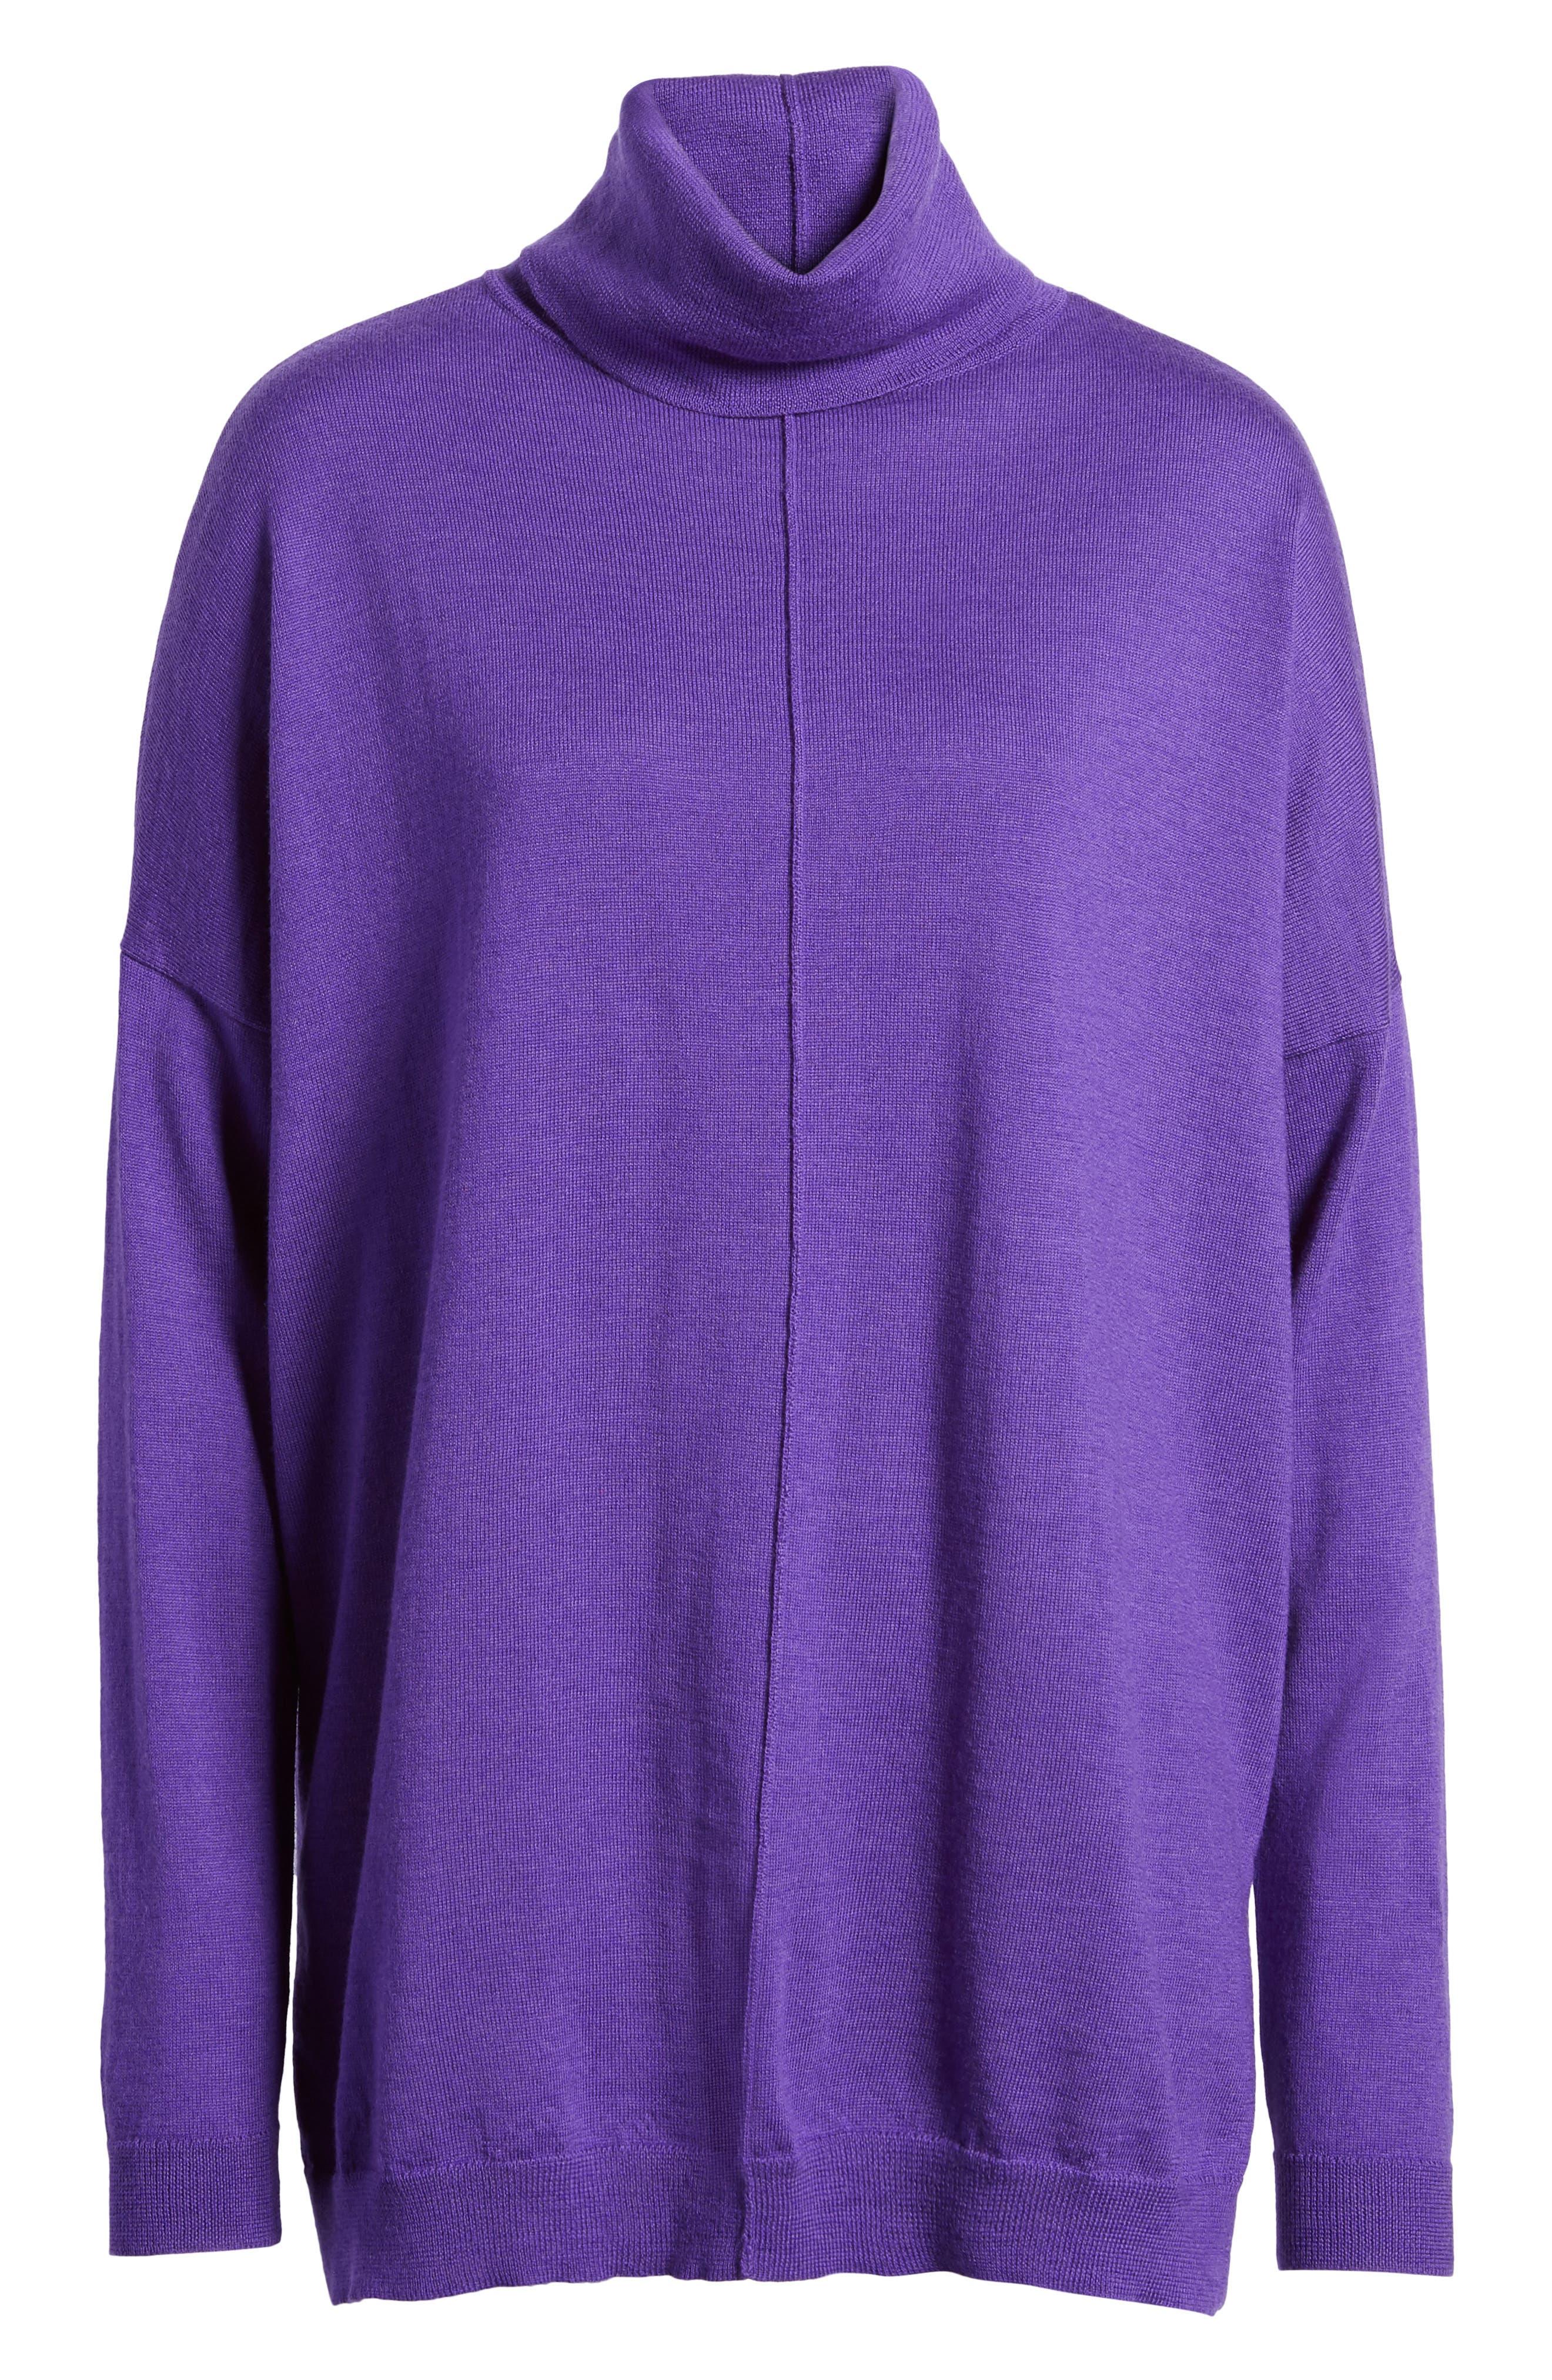 Merino Wool Boxy Turtleneck Sweater,                             Alternate thumbnail 35, color,